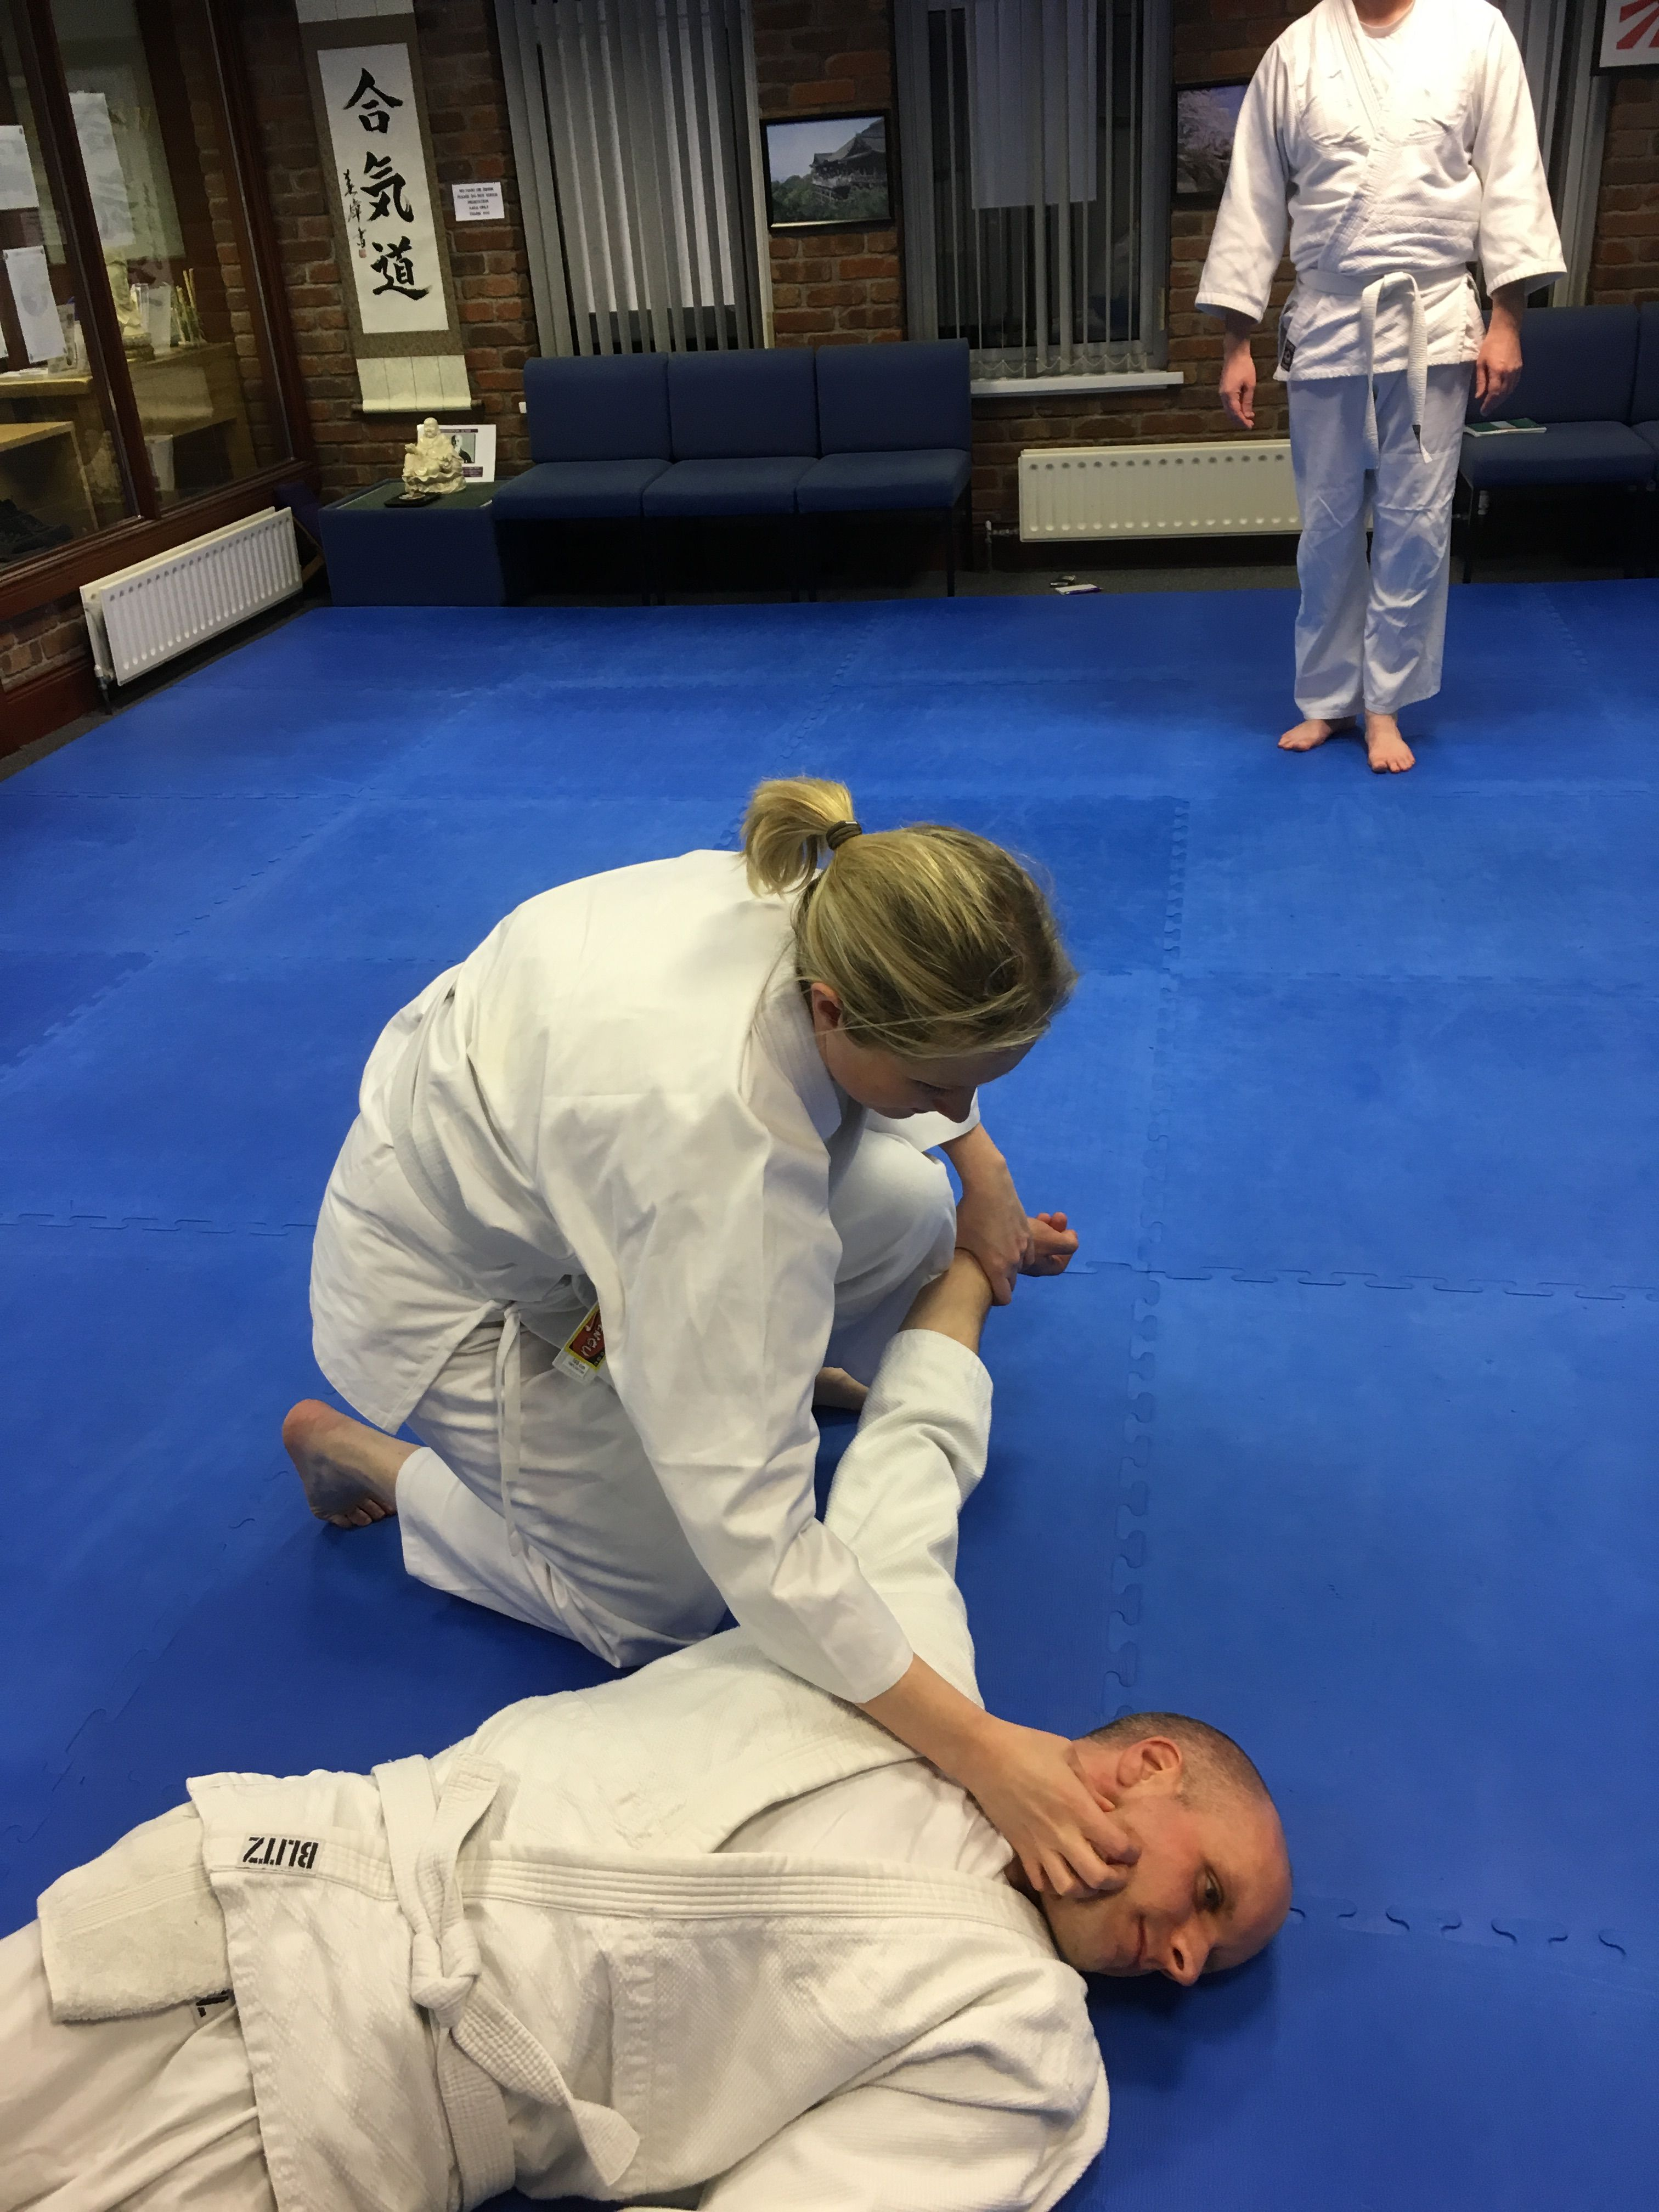 Aikido student restrains attacker using pressure point